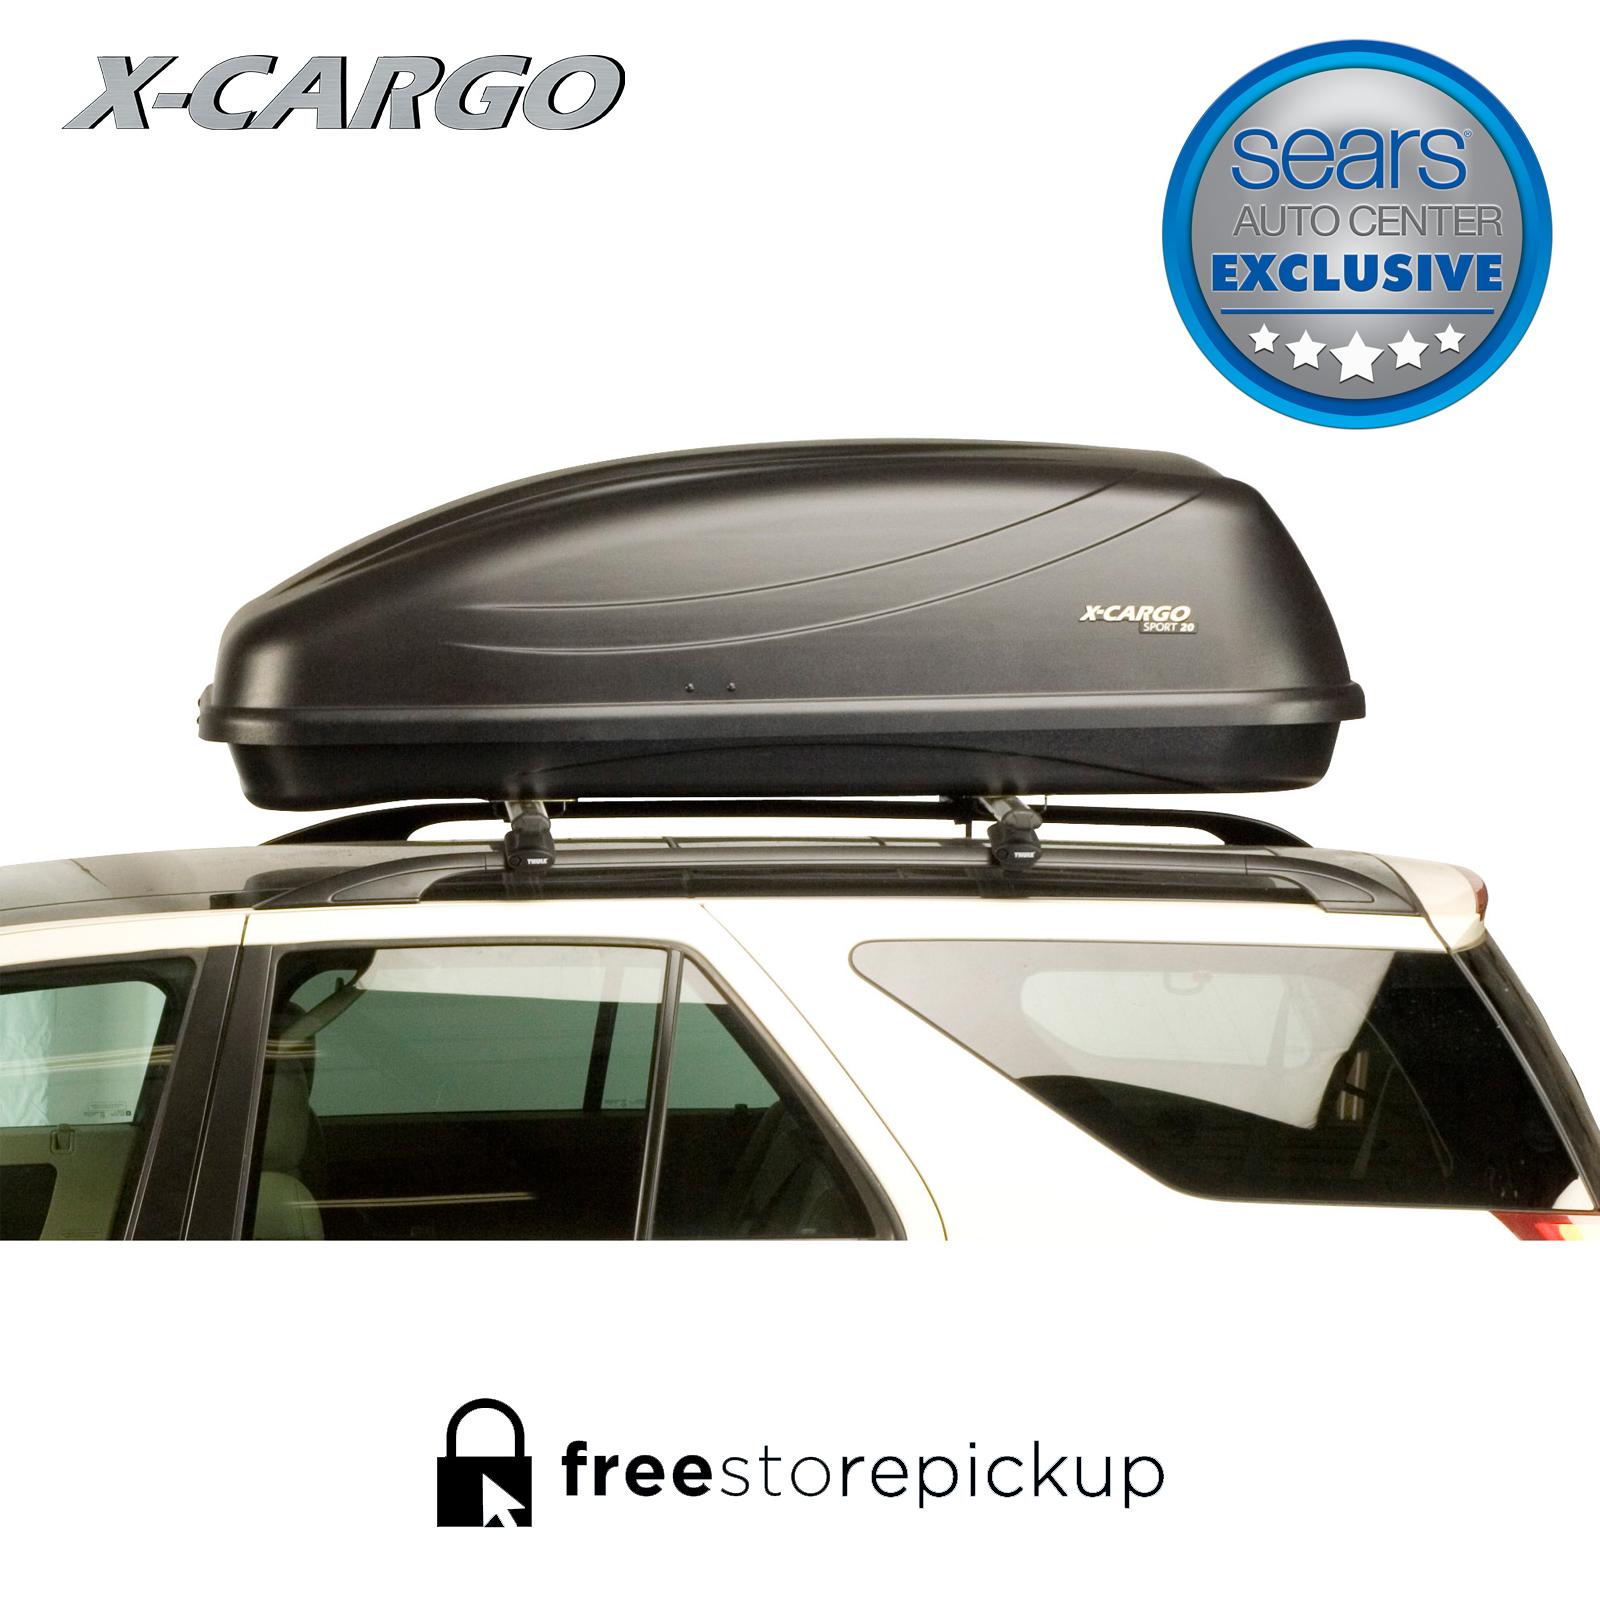 X Cargo Sport Black 90035P 20 Cu Ft Car Top Carrier